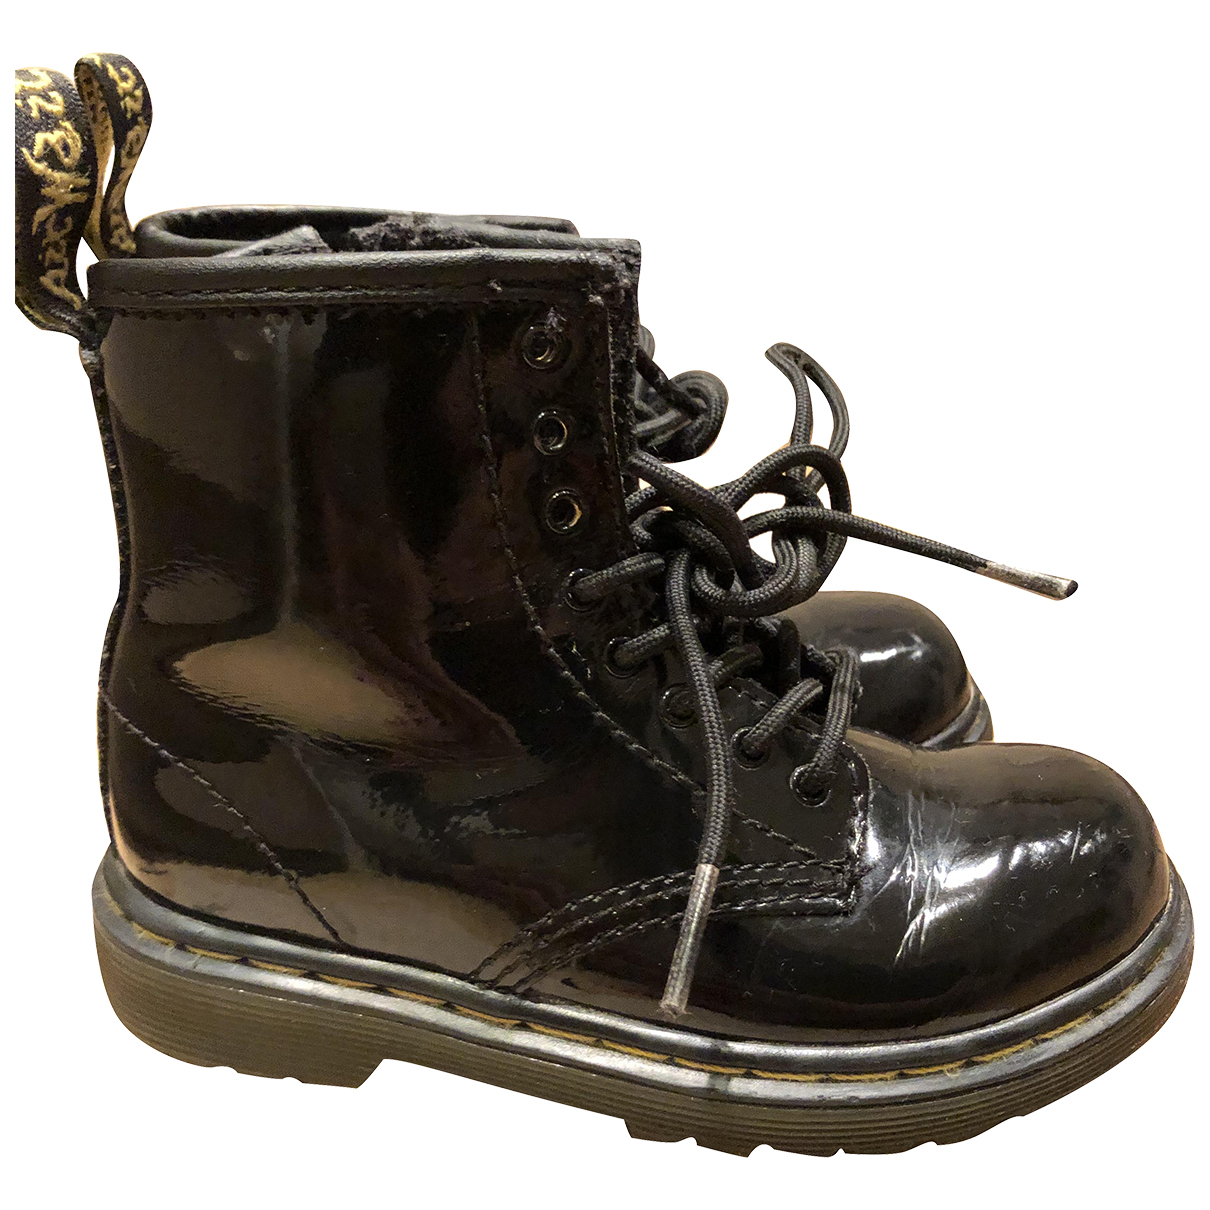 Dr. Martens N Black Leather Lace up boots for Kids 26 FR